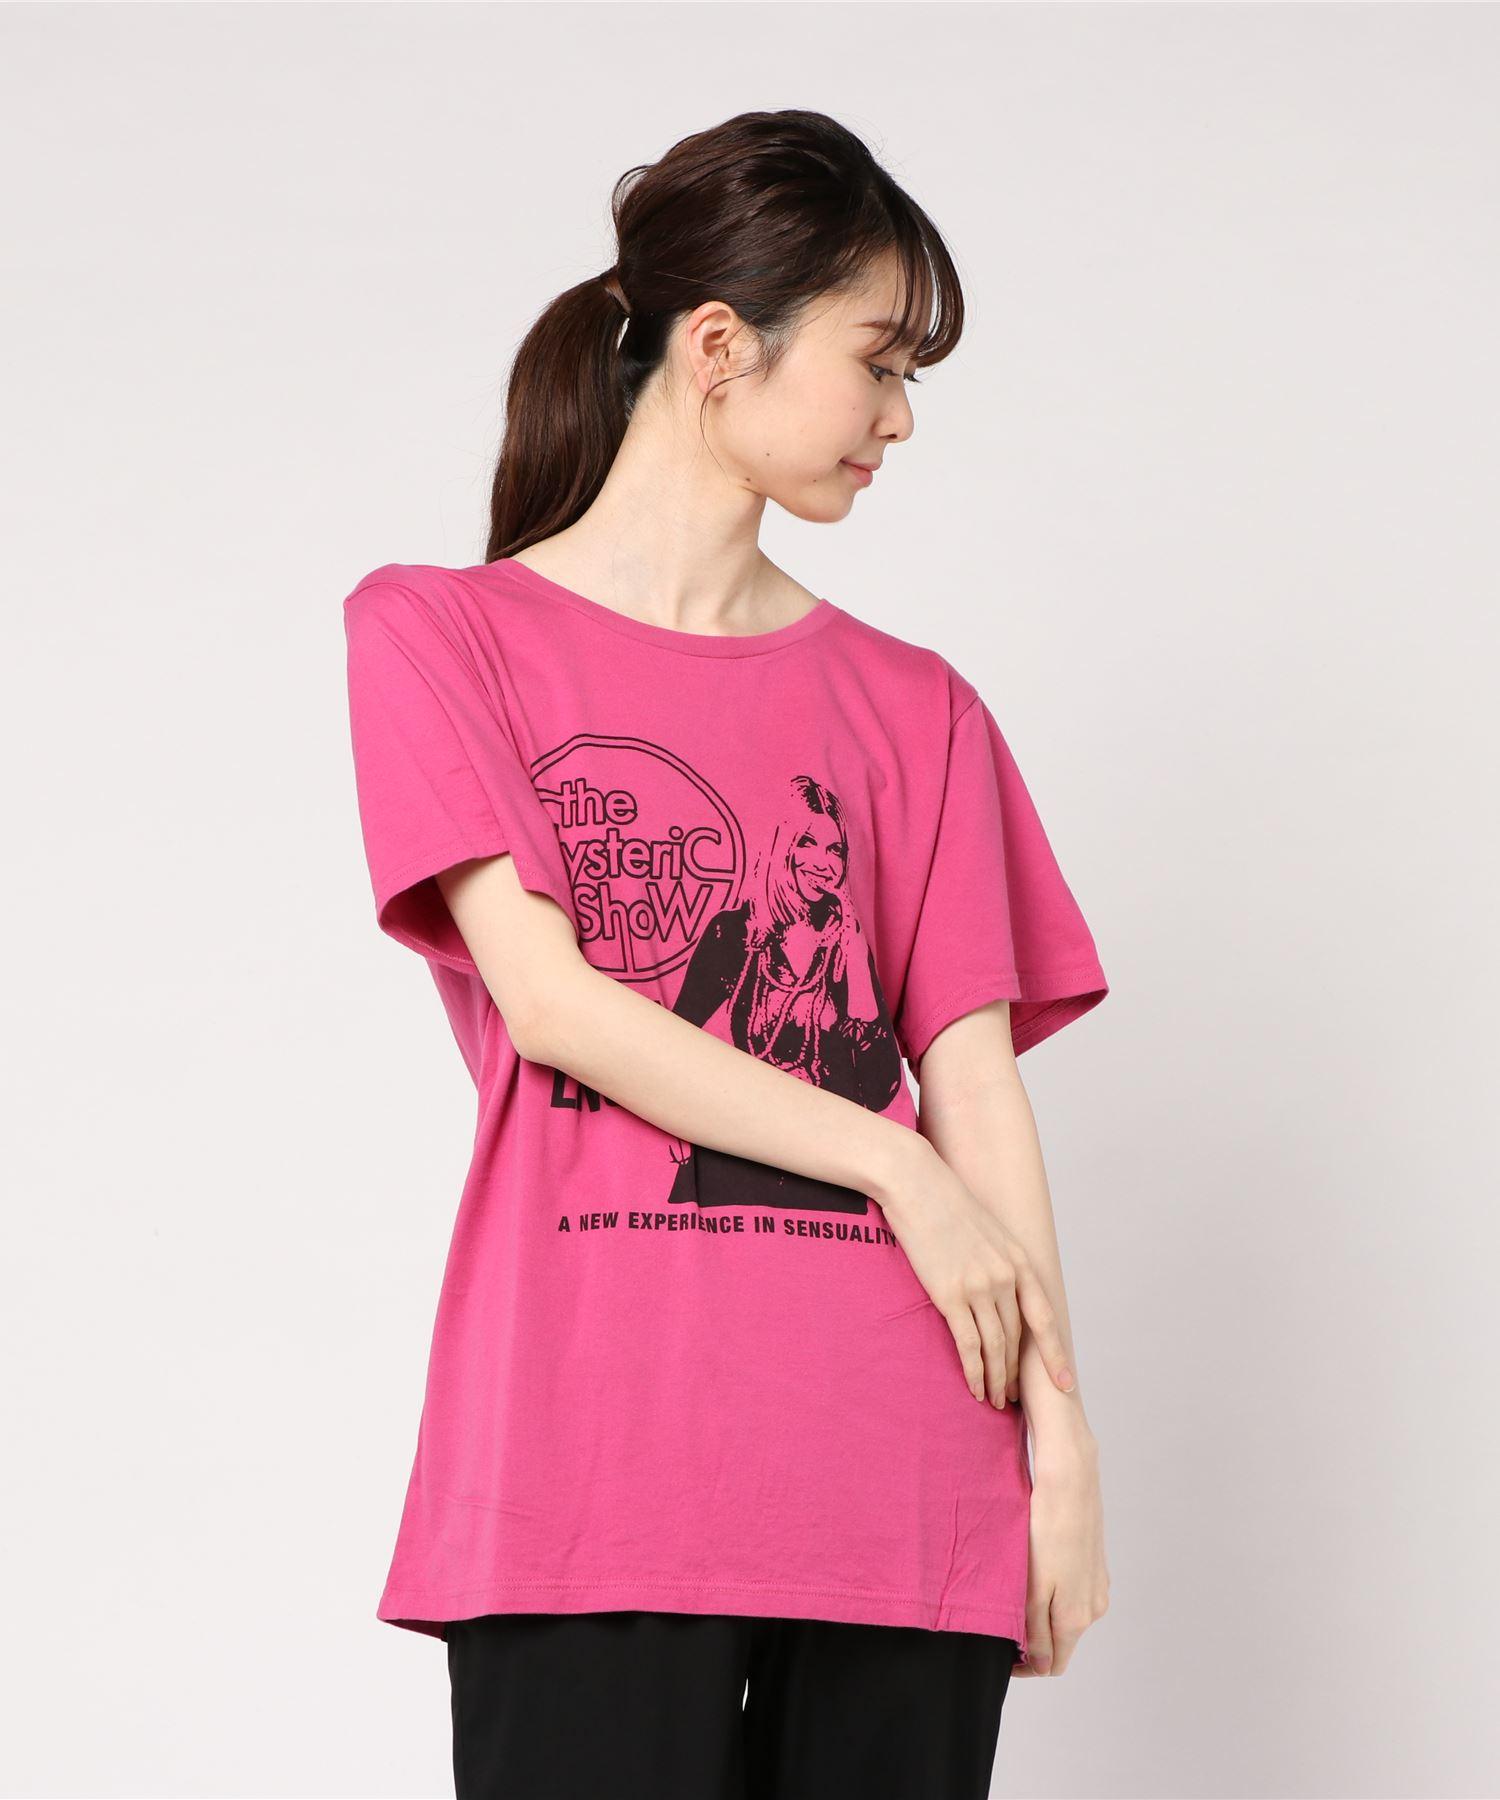 THE HYS SHOW pt ビッグTシャツ